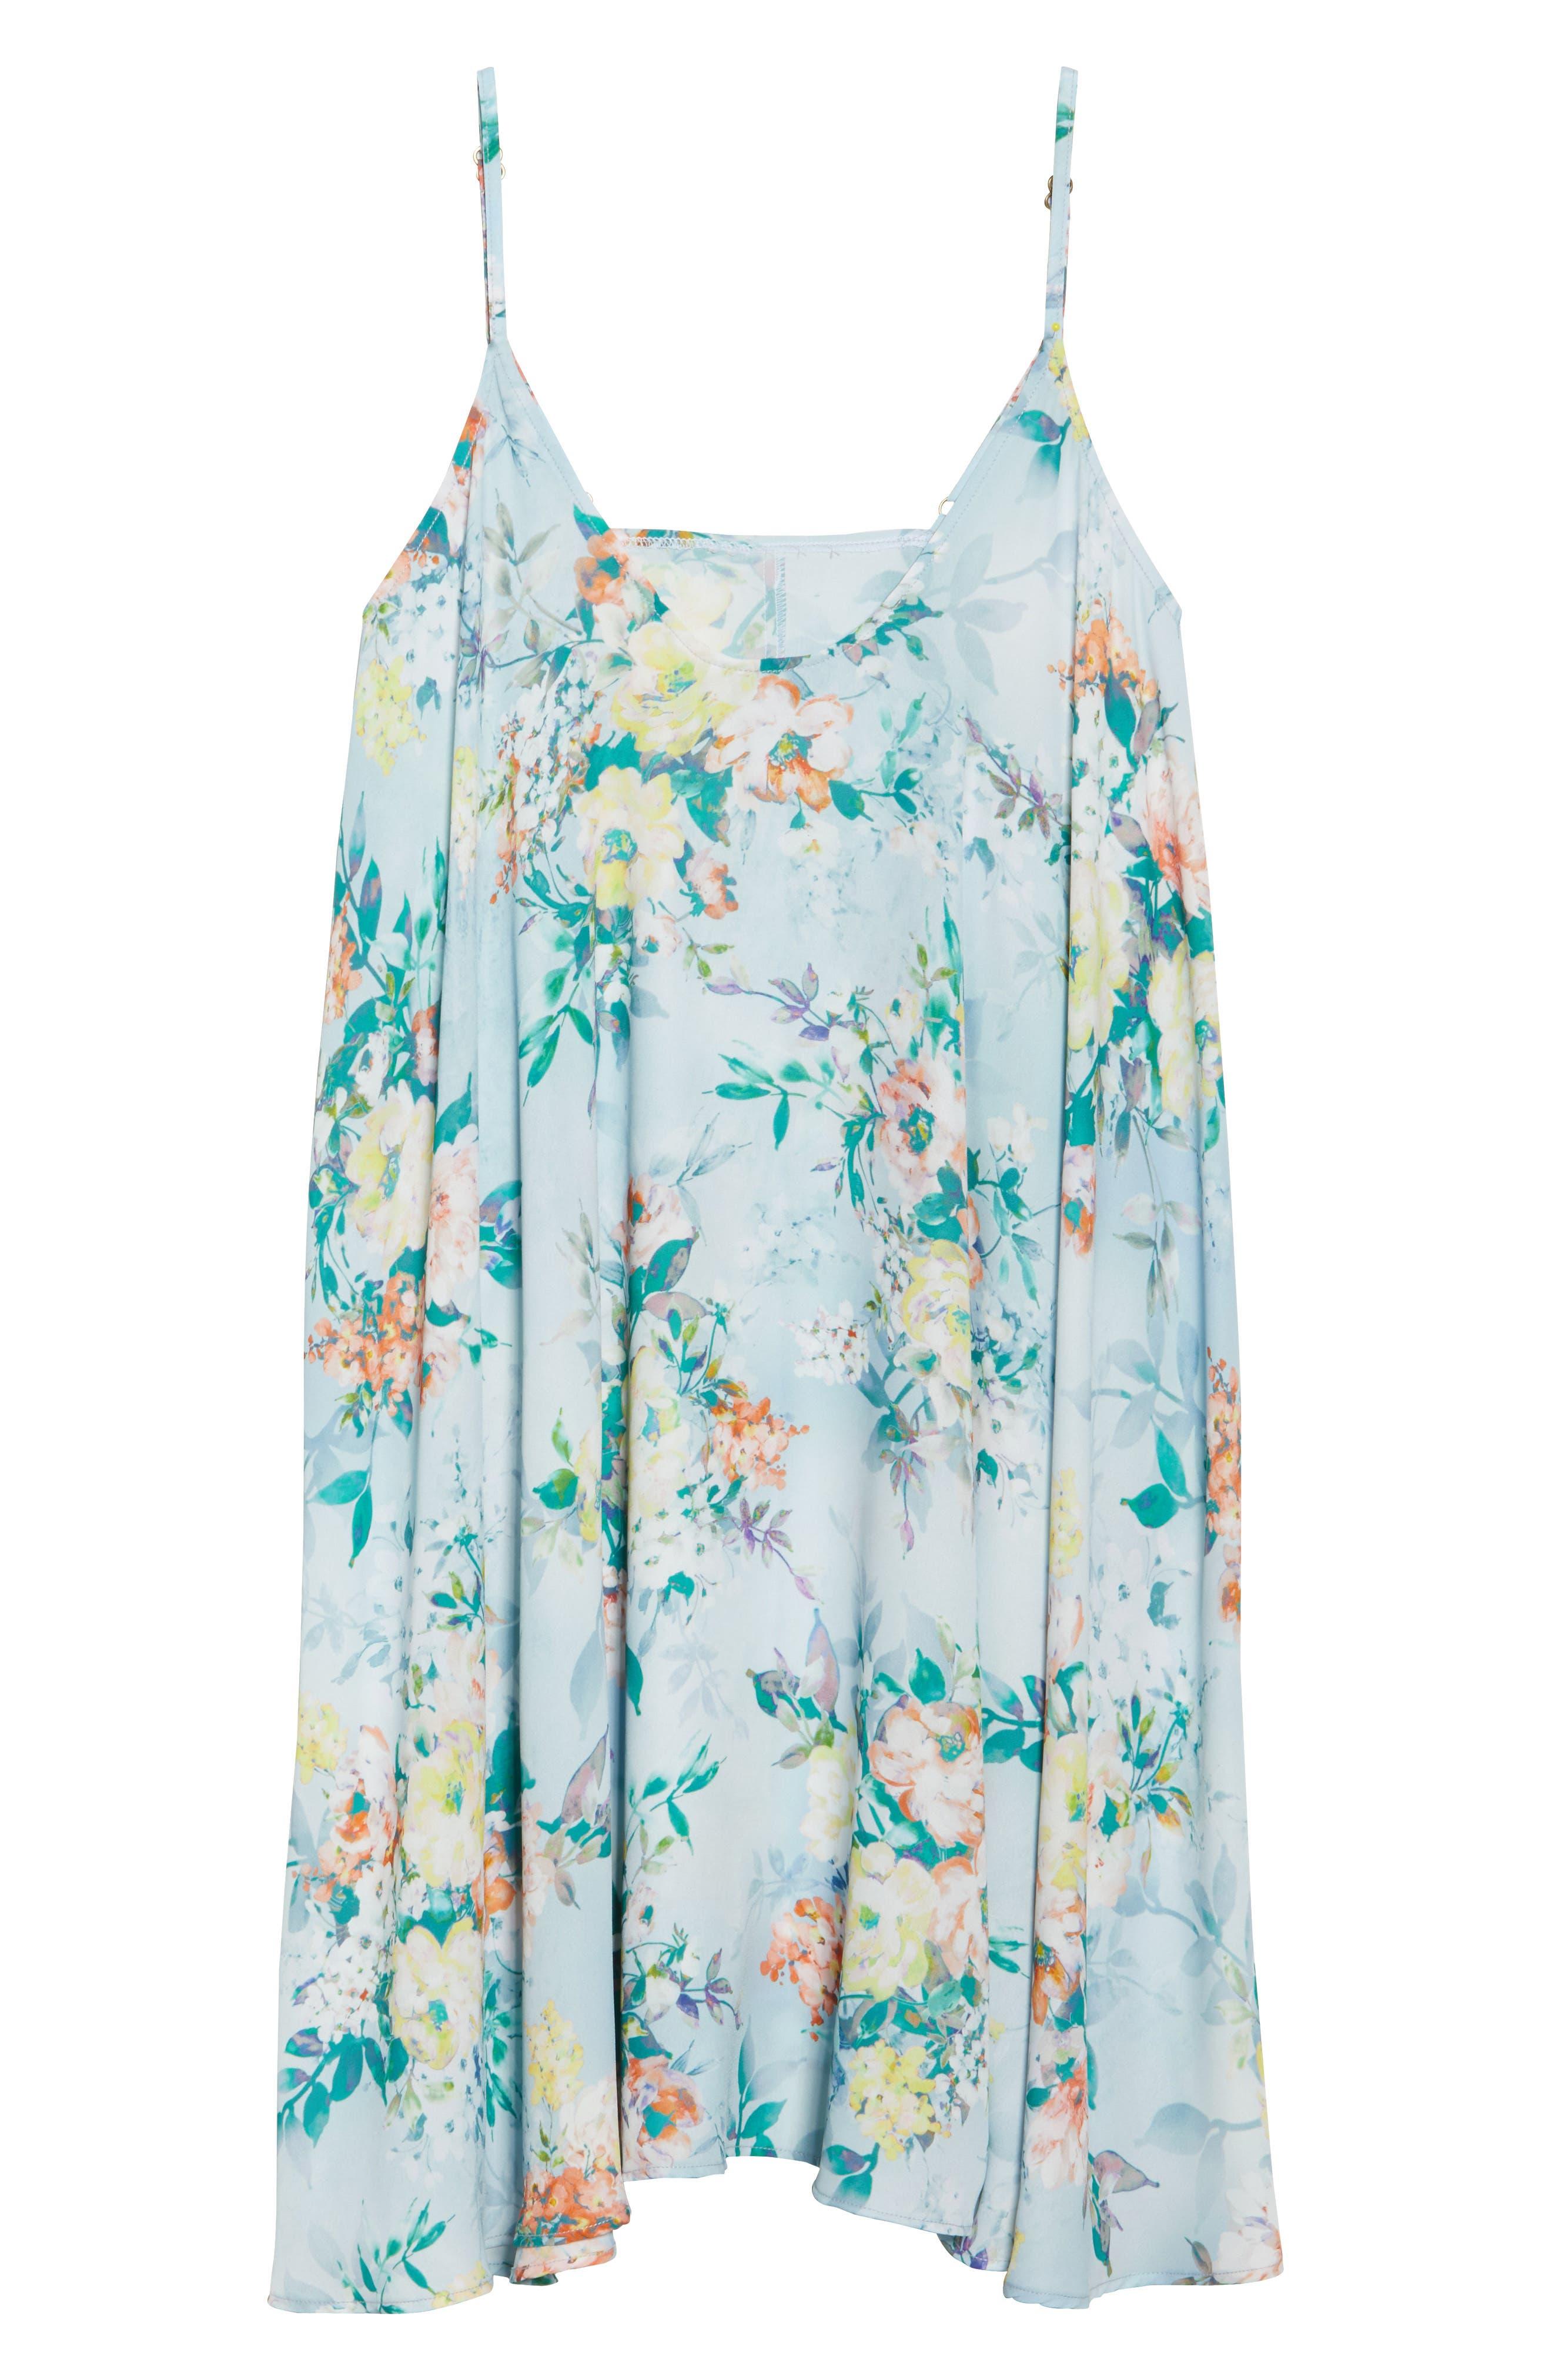 Femme Flora Cover-Up Dress,                             Alternate thumbnail 6, color,                             Blue Multi